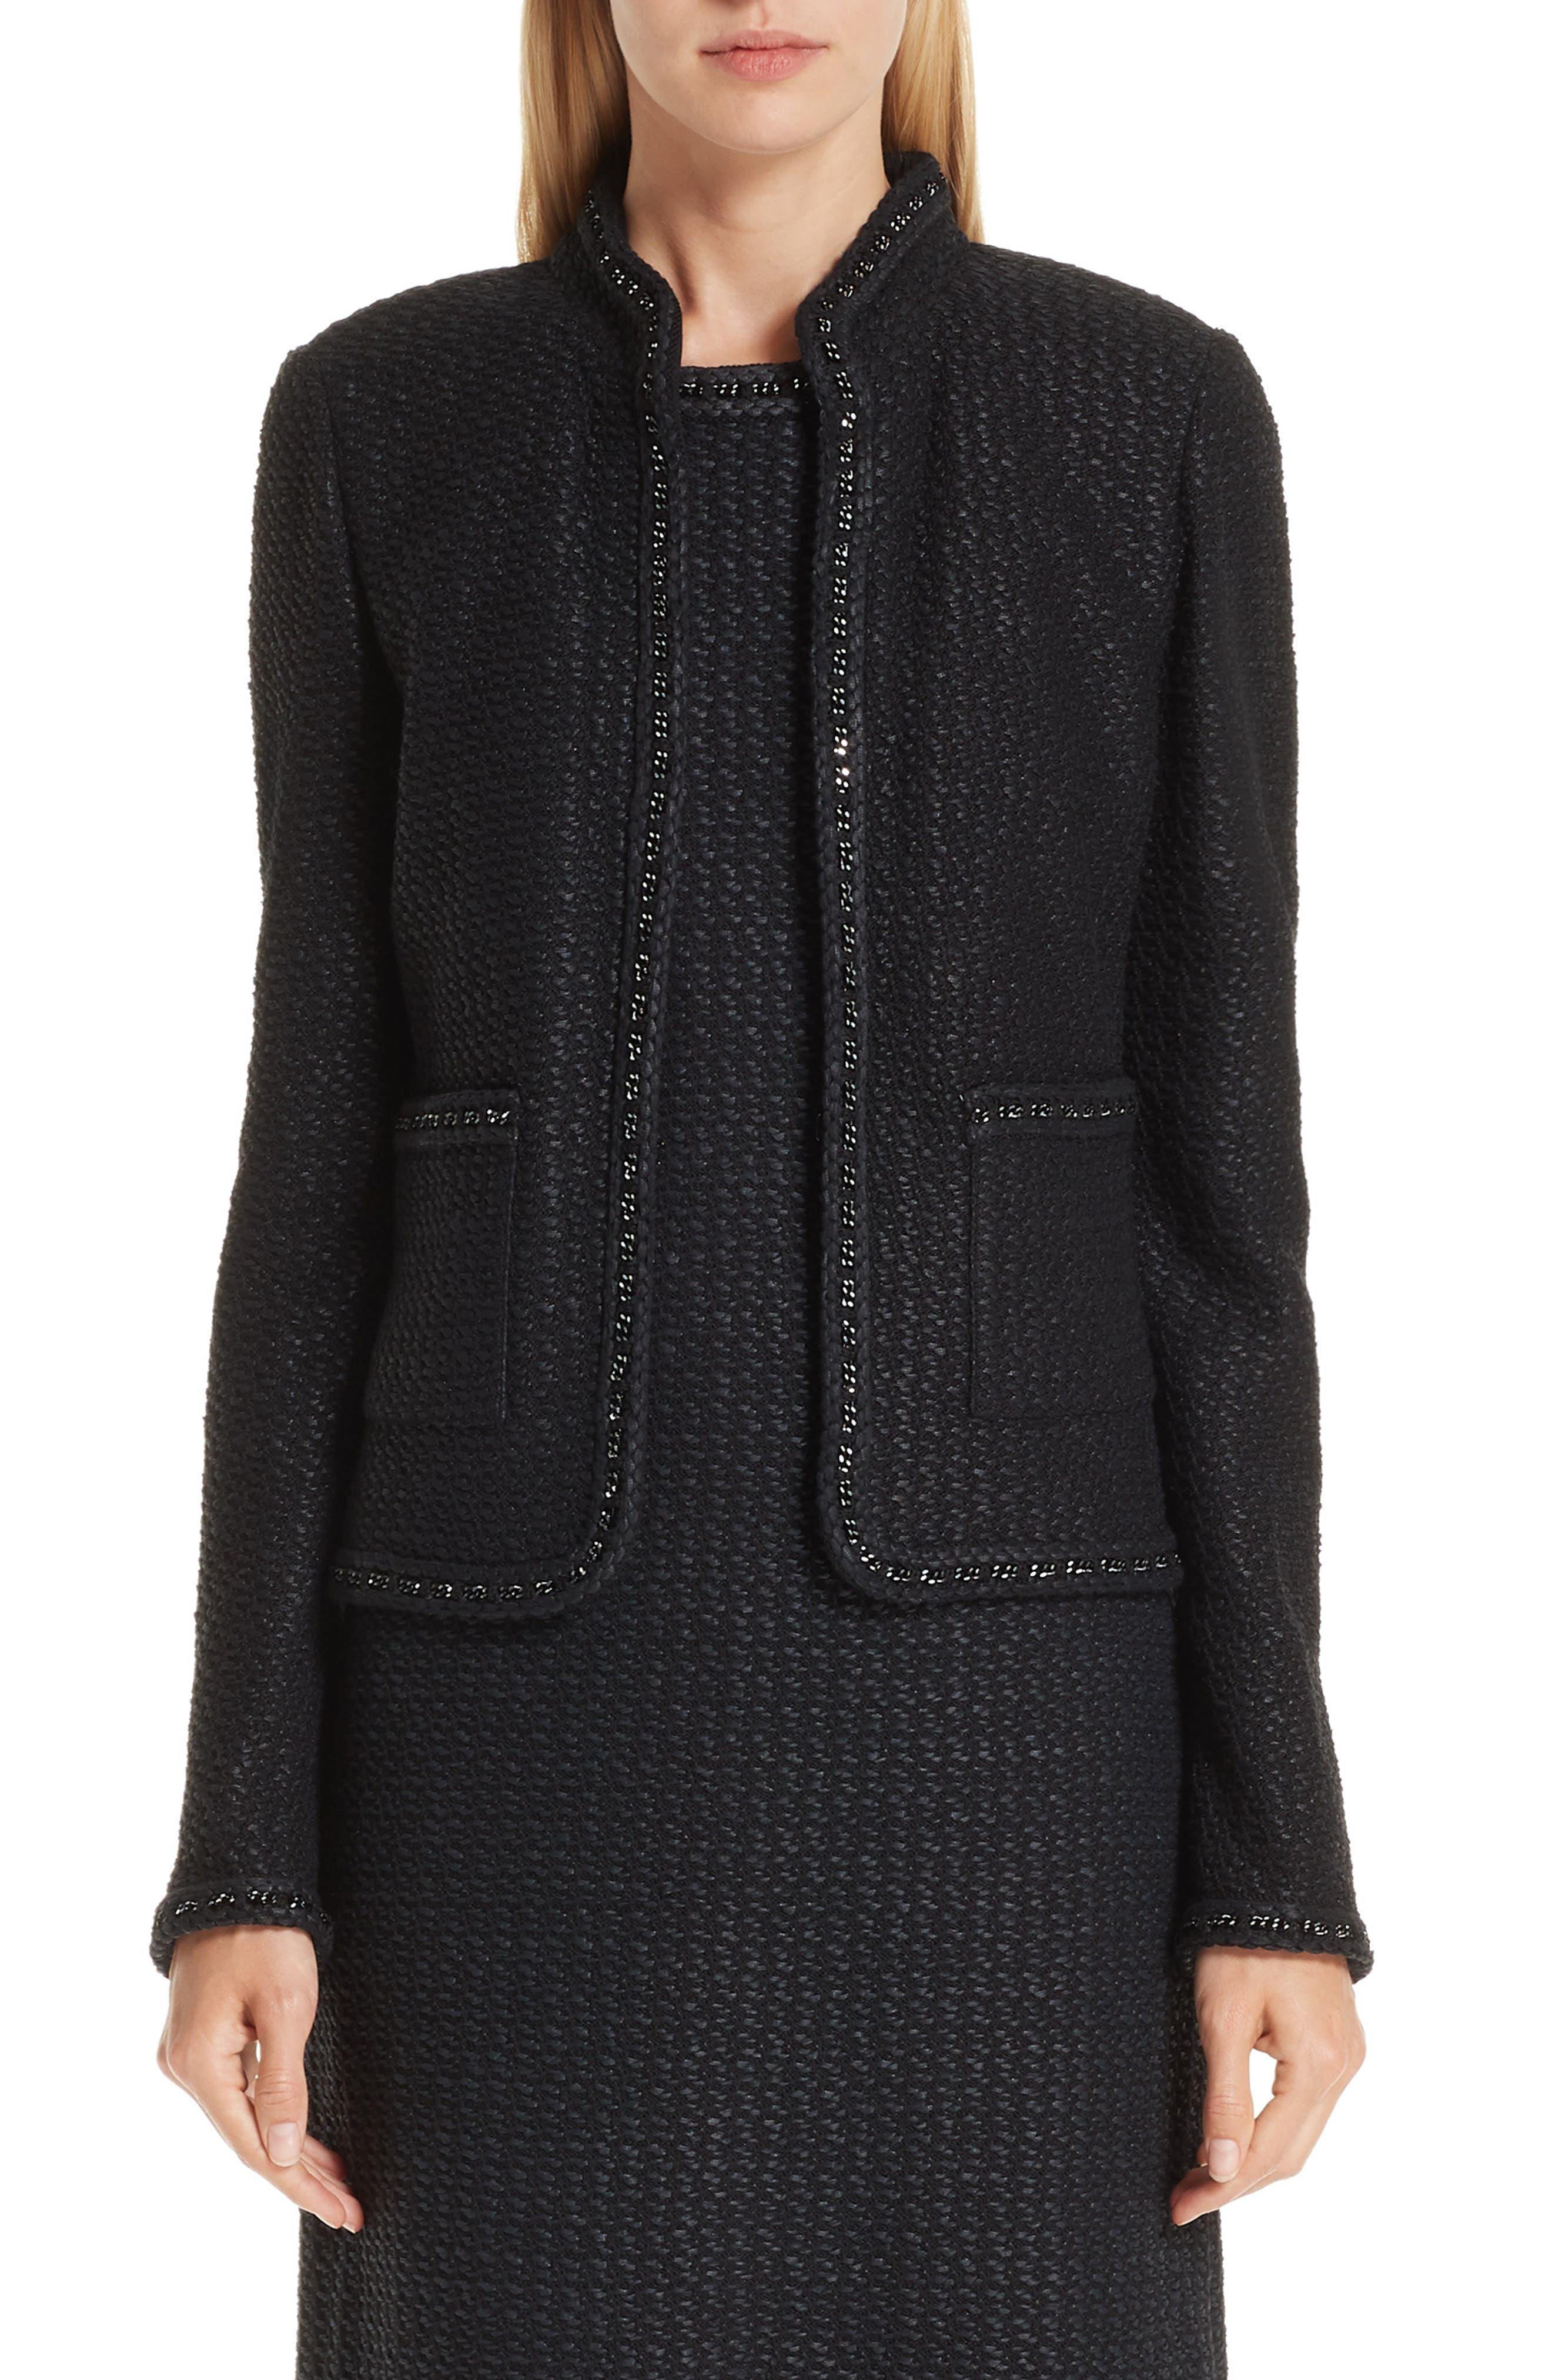 Adina Knit Short Jacket,                             Main thumbnail 1, color,                             CAVIAR